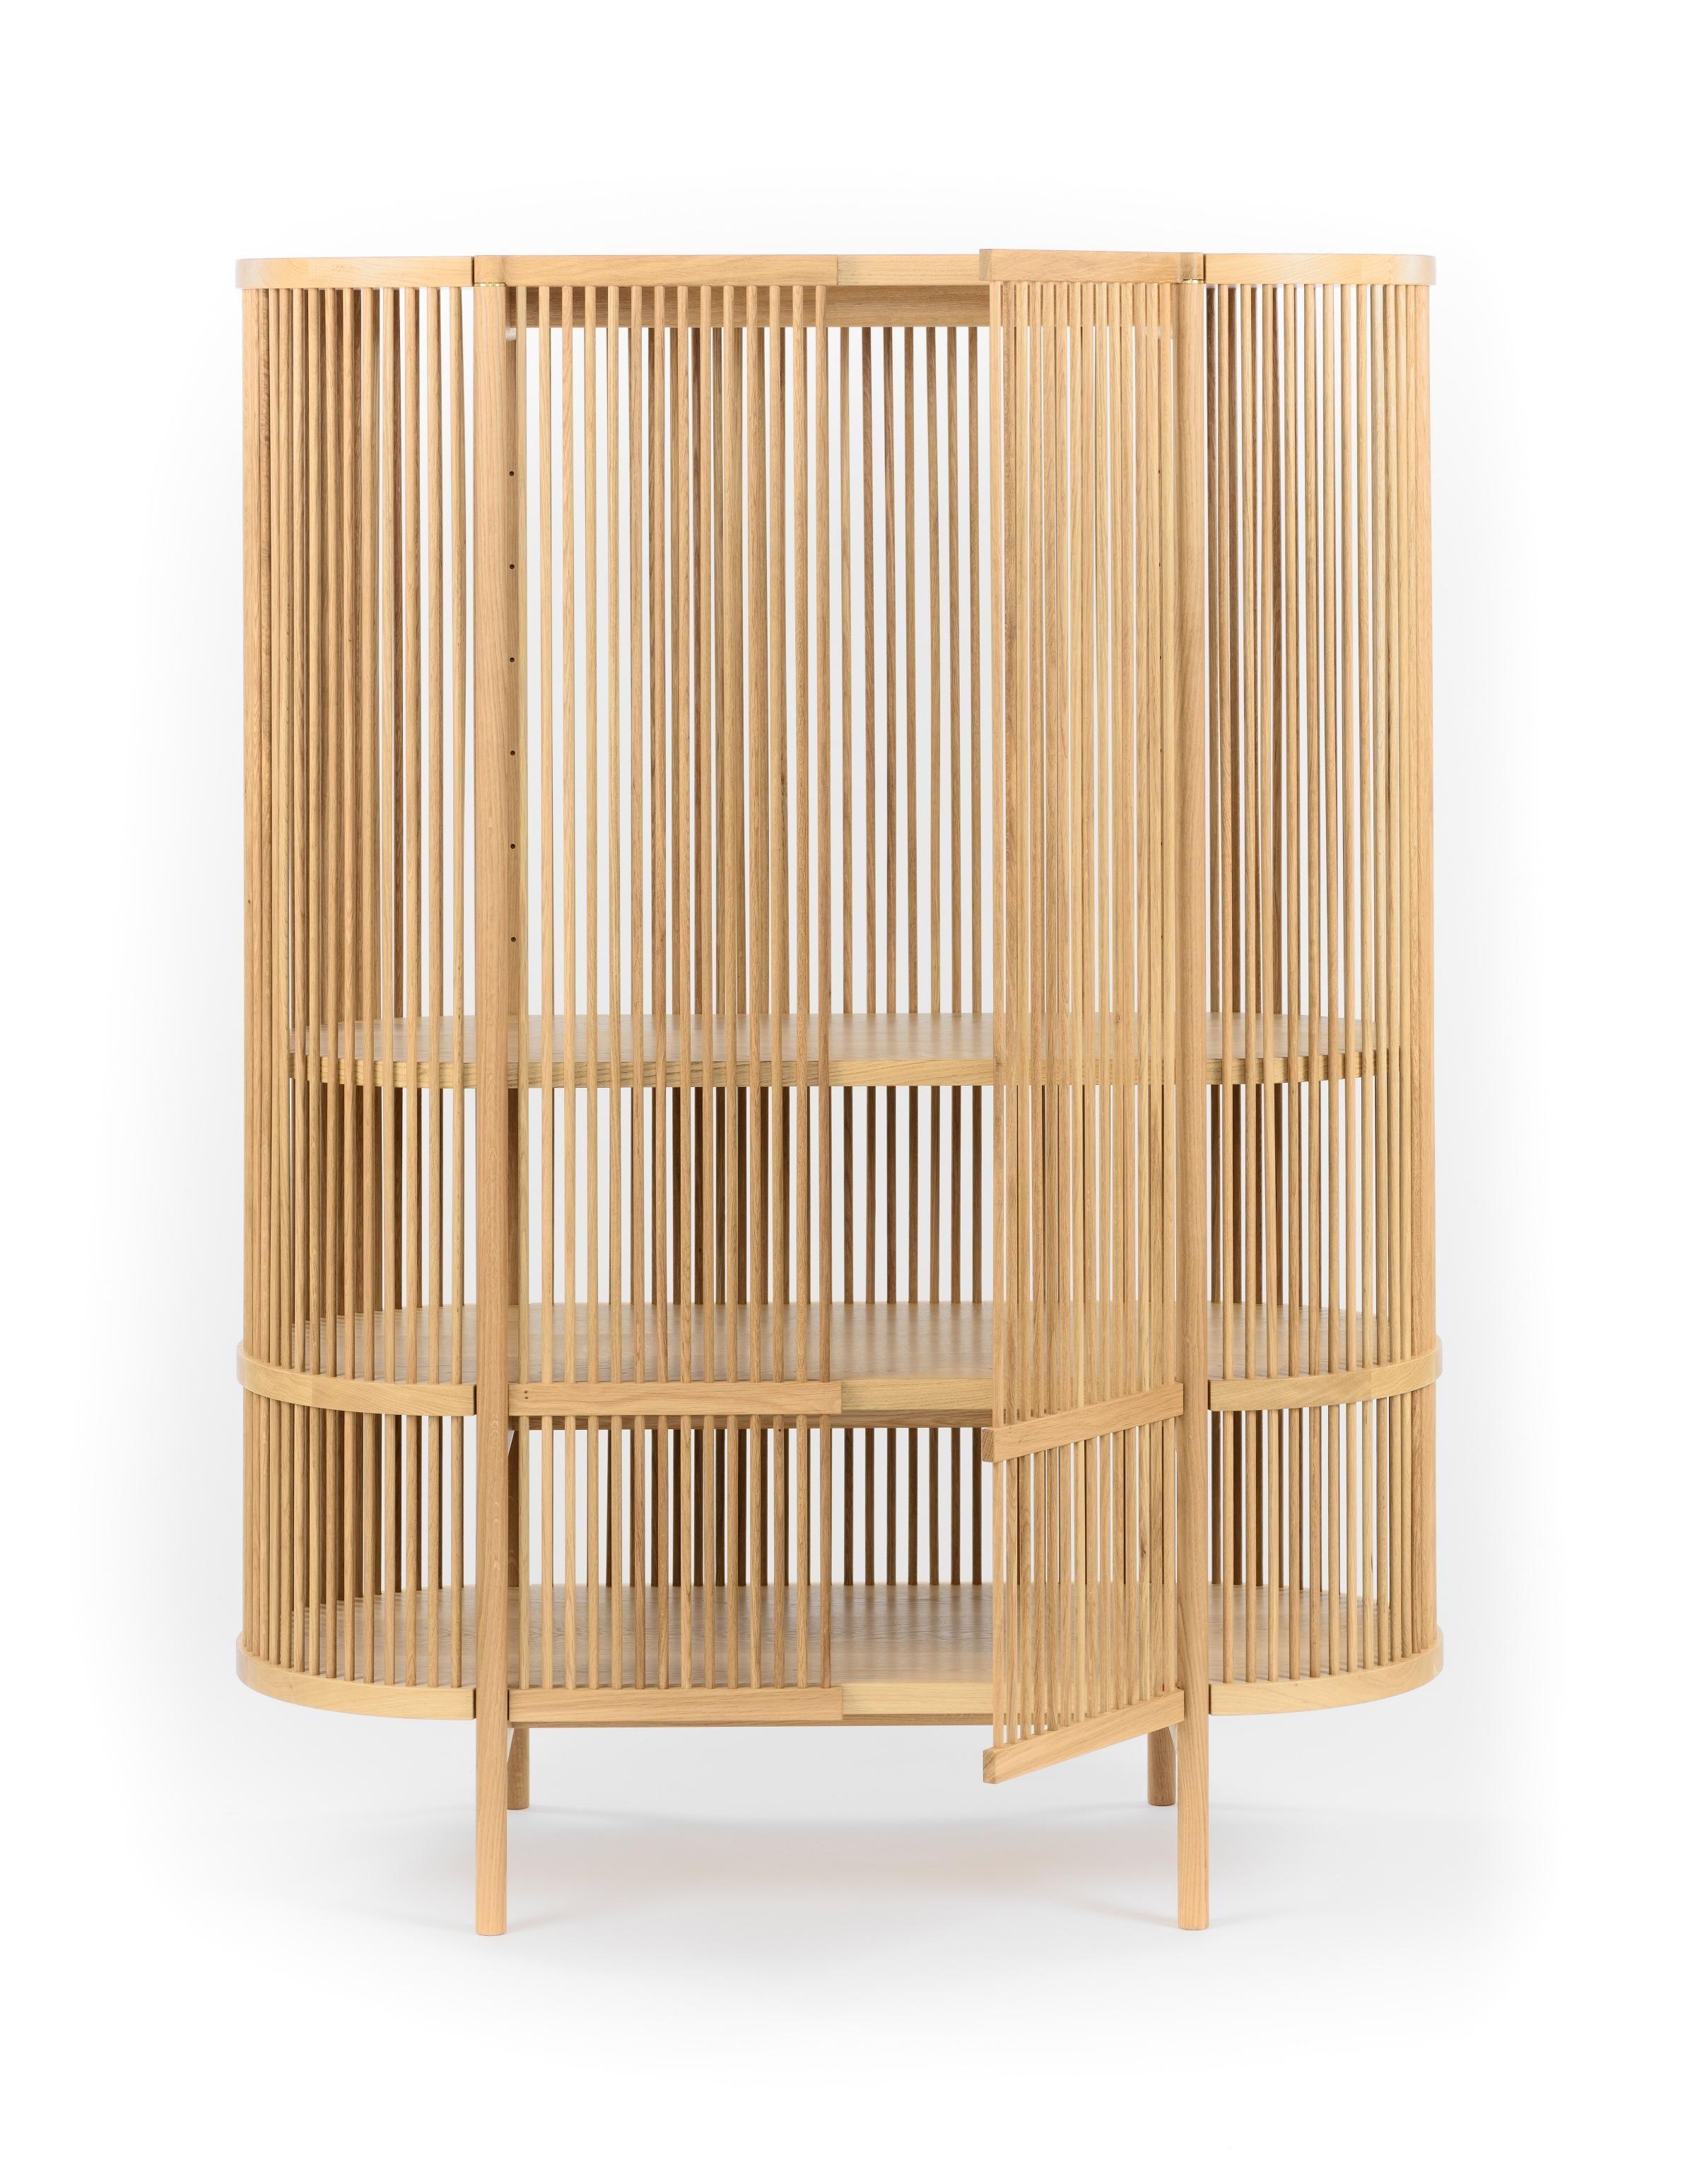 Bastone Cabinet in Oak with Doors